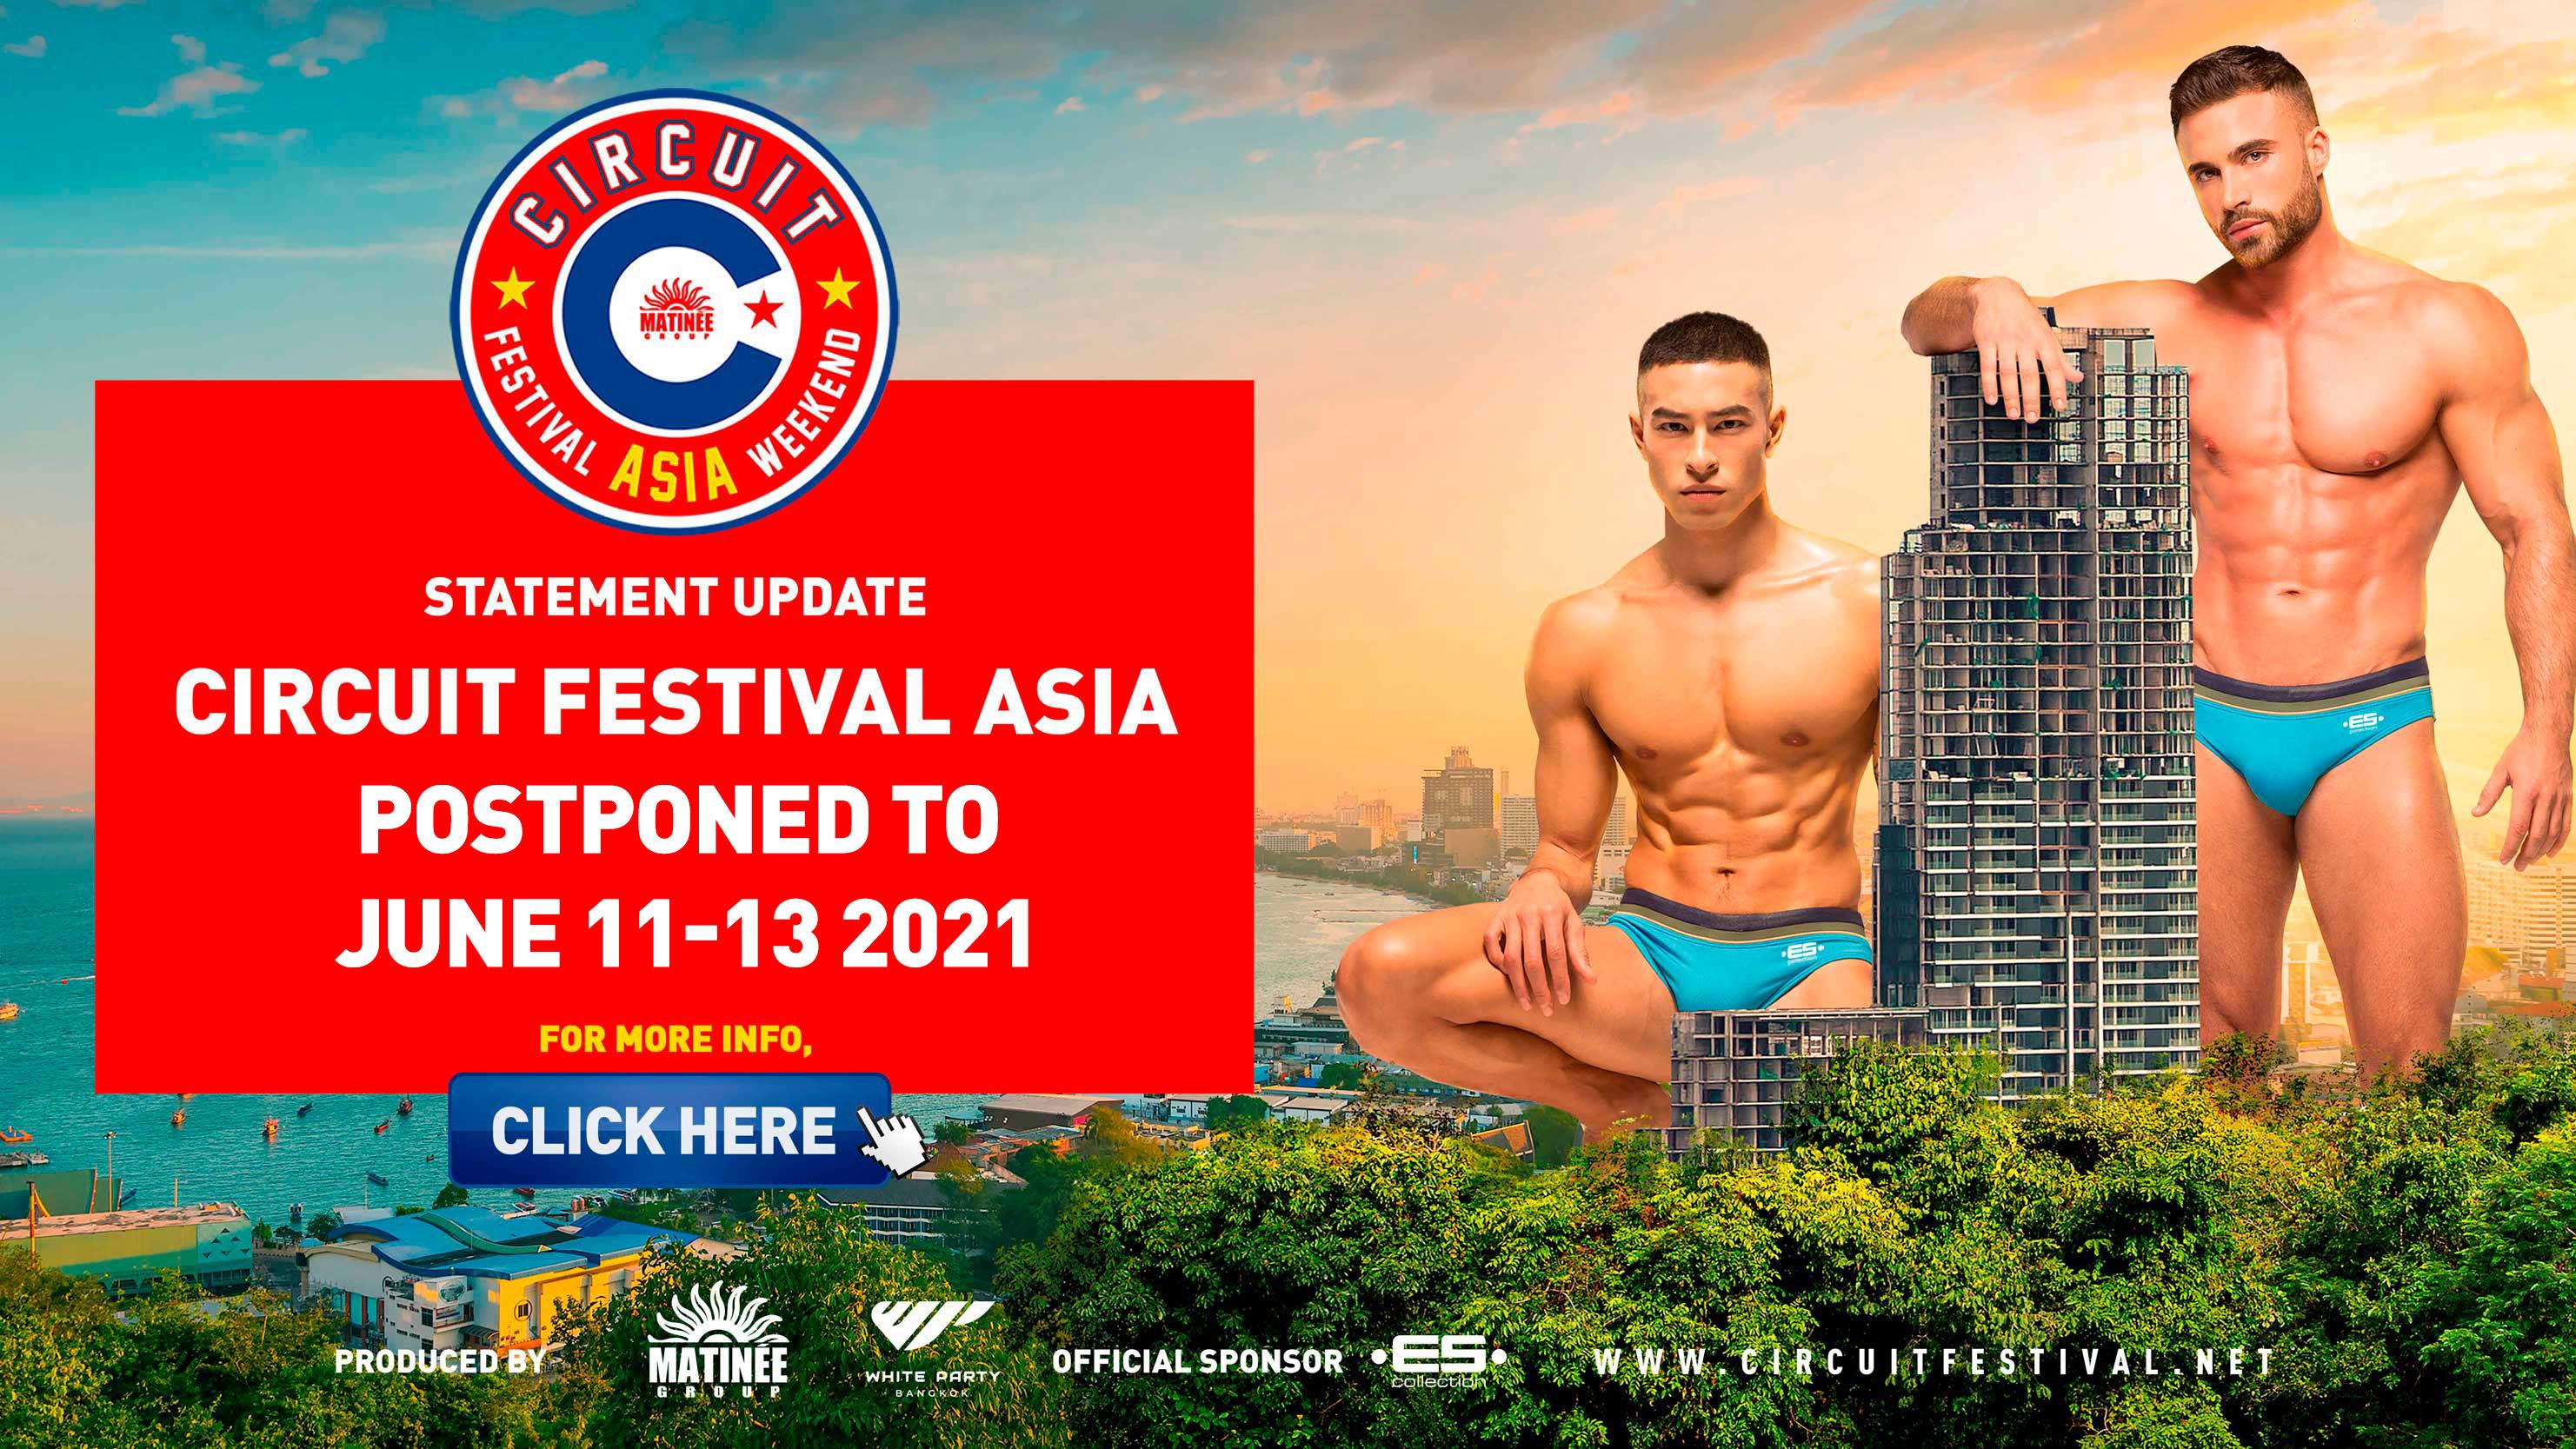 circuitfestival_asia_web_gayfestival_gayparty_asia_circuit_festival_event_gay_party_2